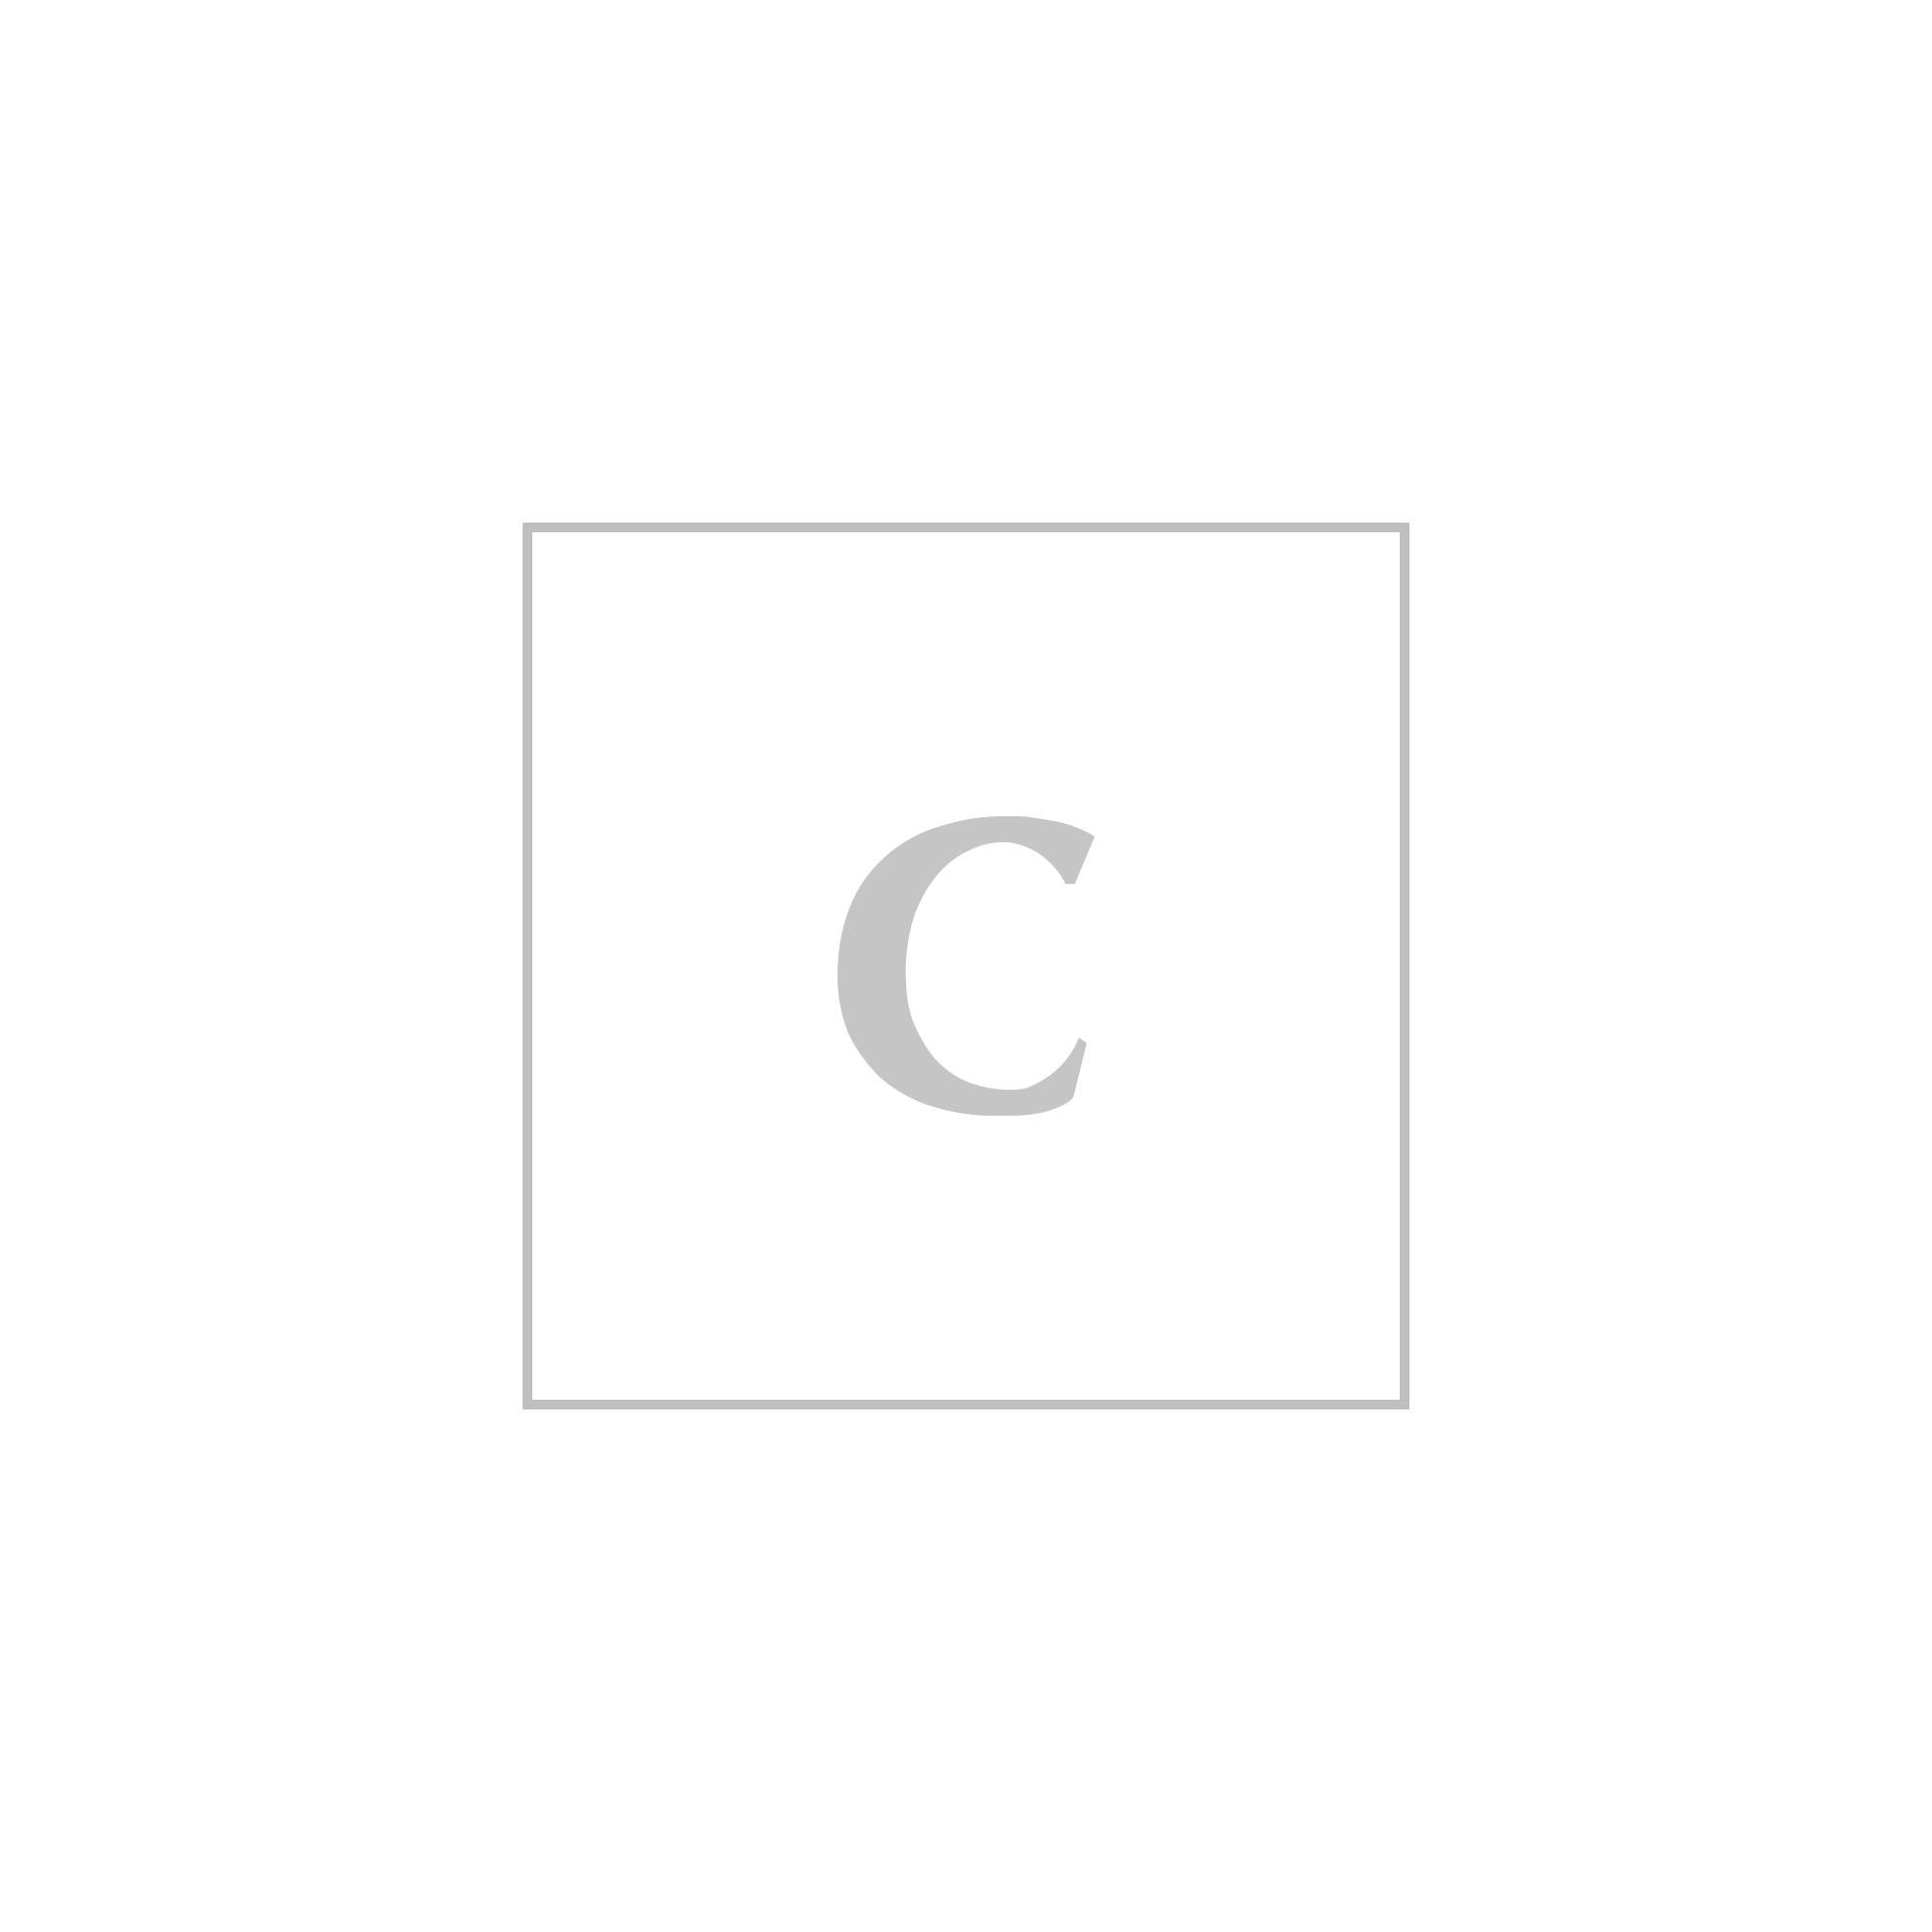 8b1ded644017b5 Moncler grenoble felpa stampa logo